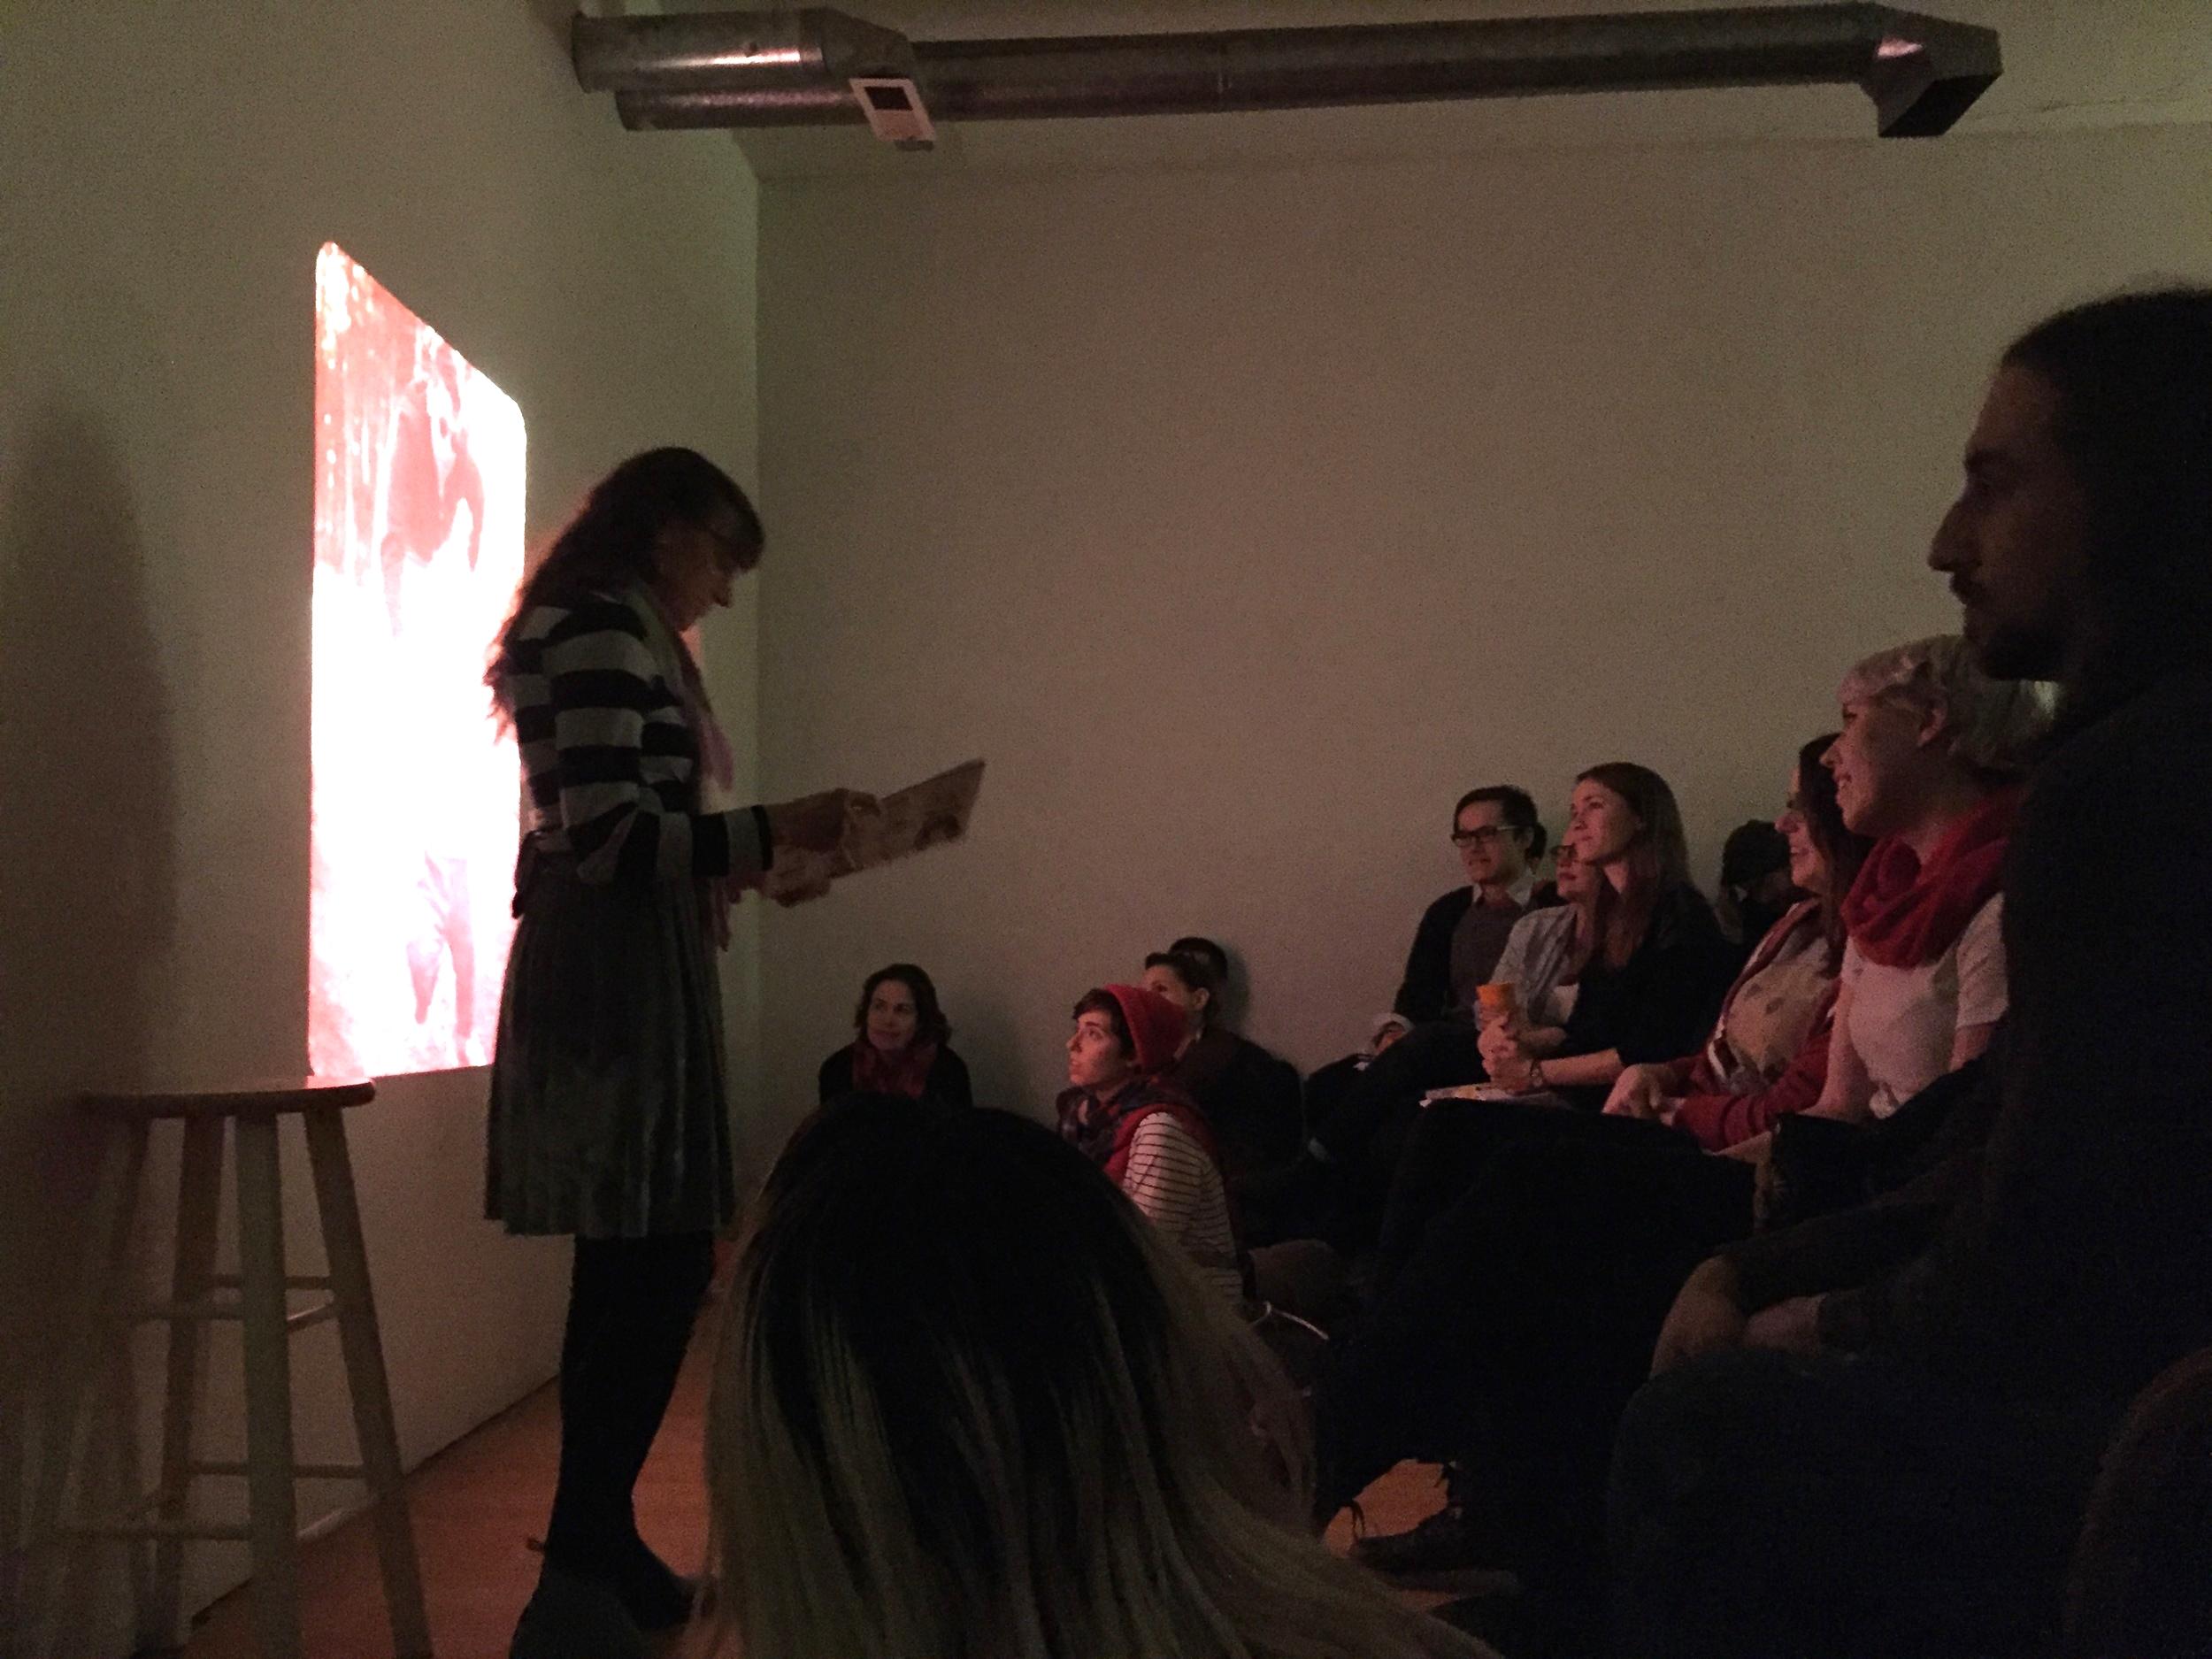 Nancy Kangas telling family secrets in the dark.